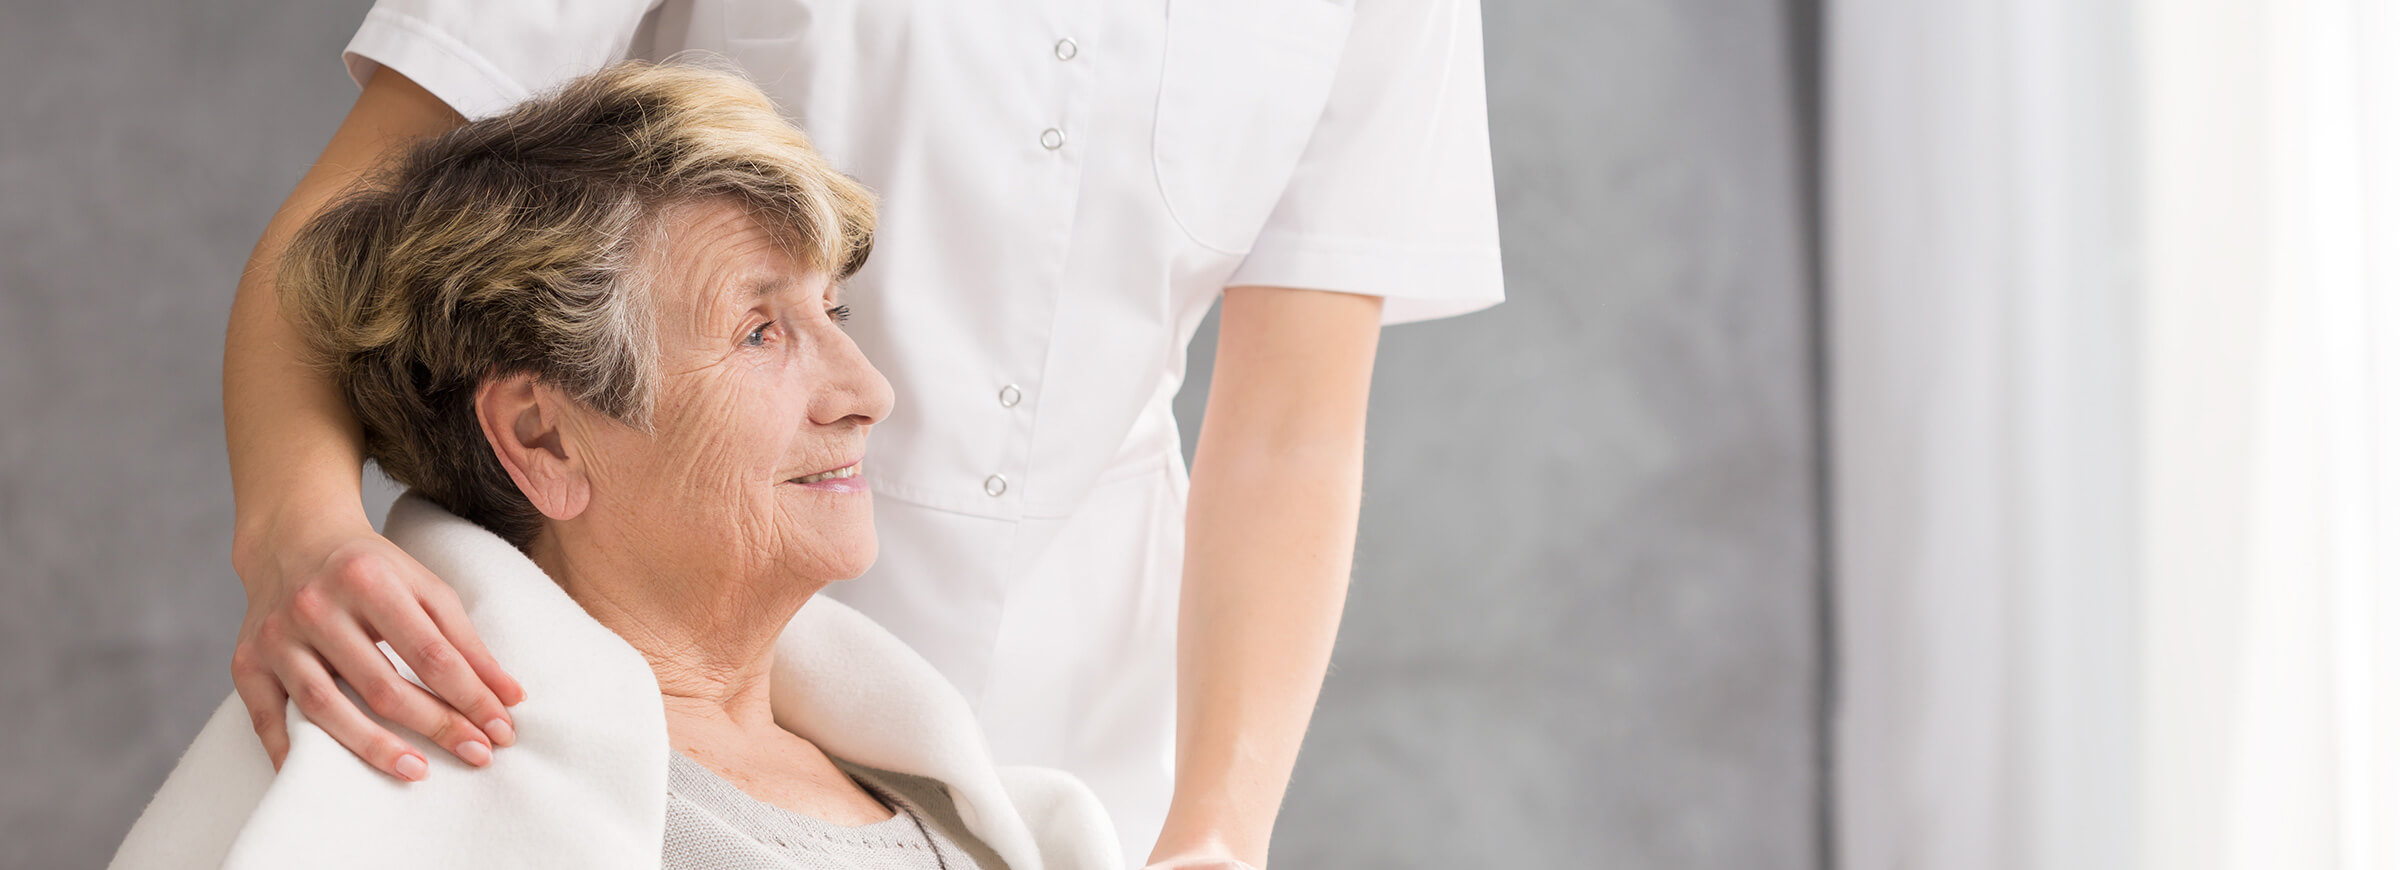 Demenzbetreuerin steht hinter älterer Dame